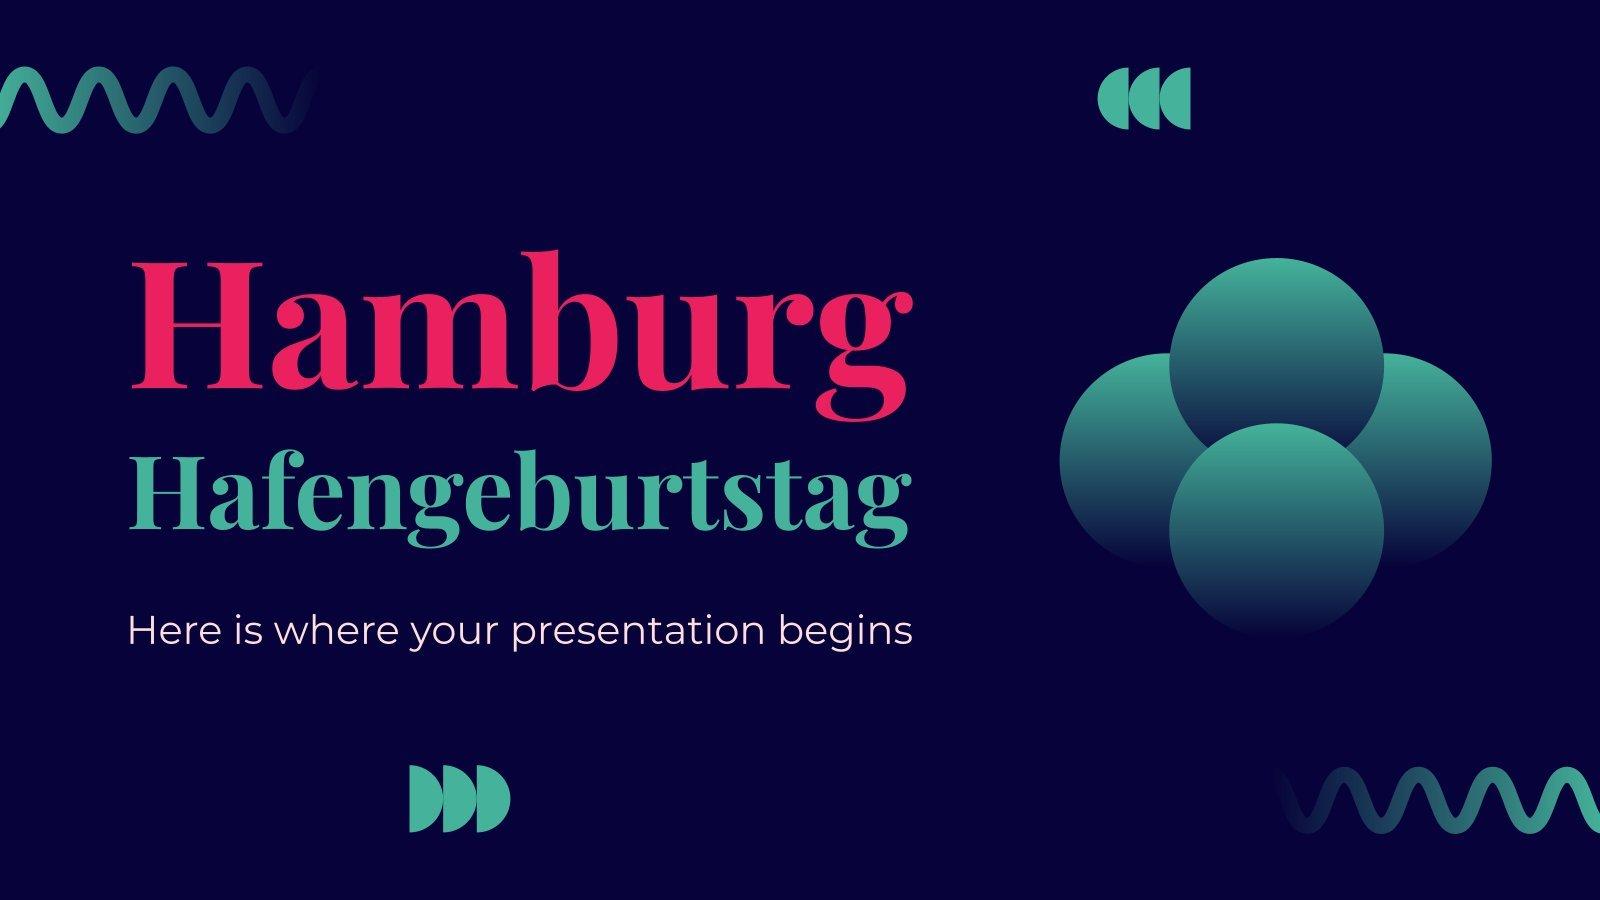 Hamburg Hafengeburtstag : Modèles de présentation